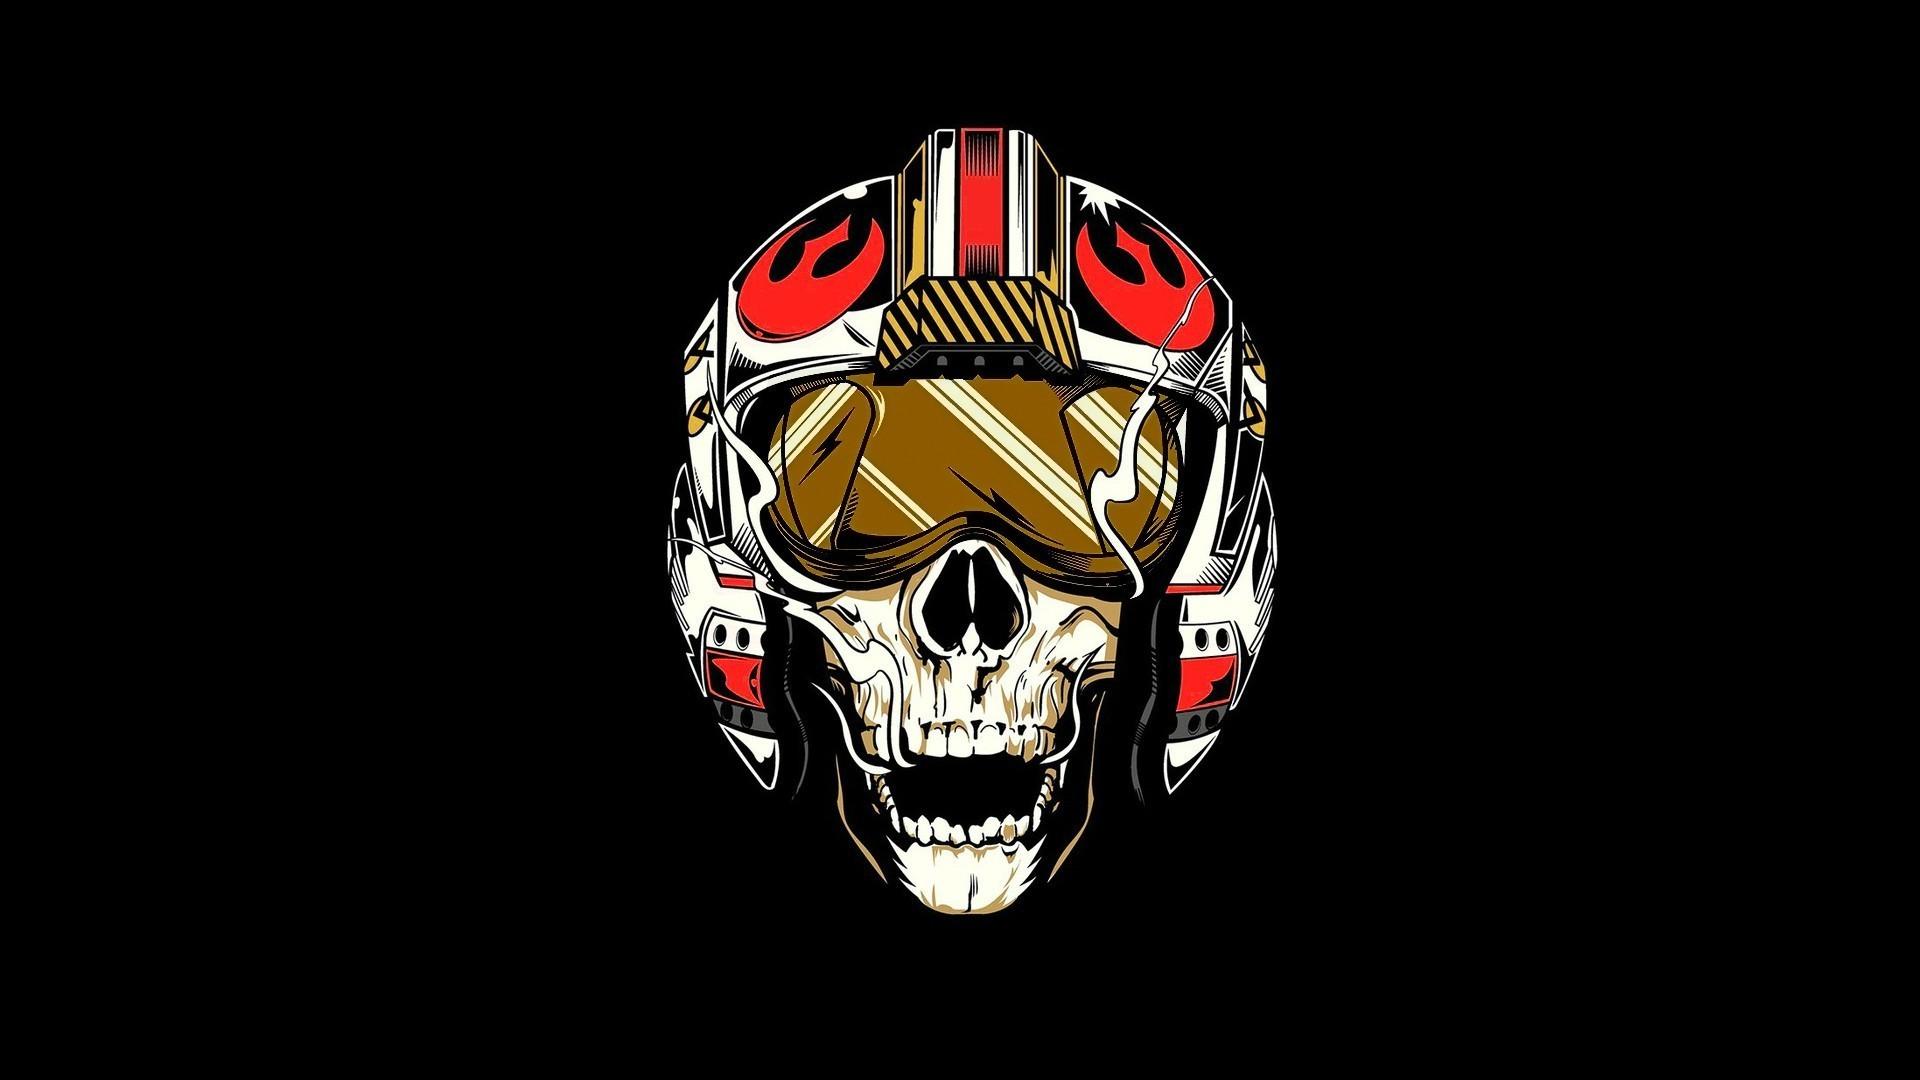 Star Wars, Rebel Alliance, Pilot, Skull Wallpapers HD / Desktop .